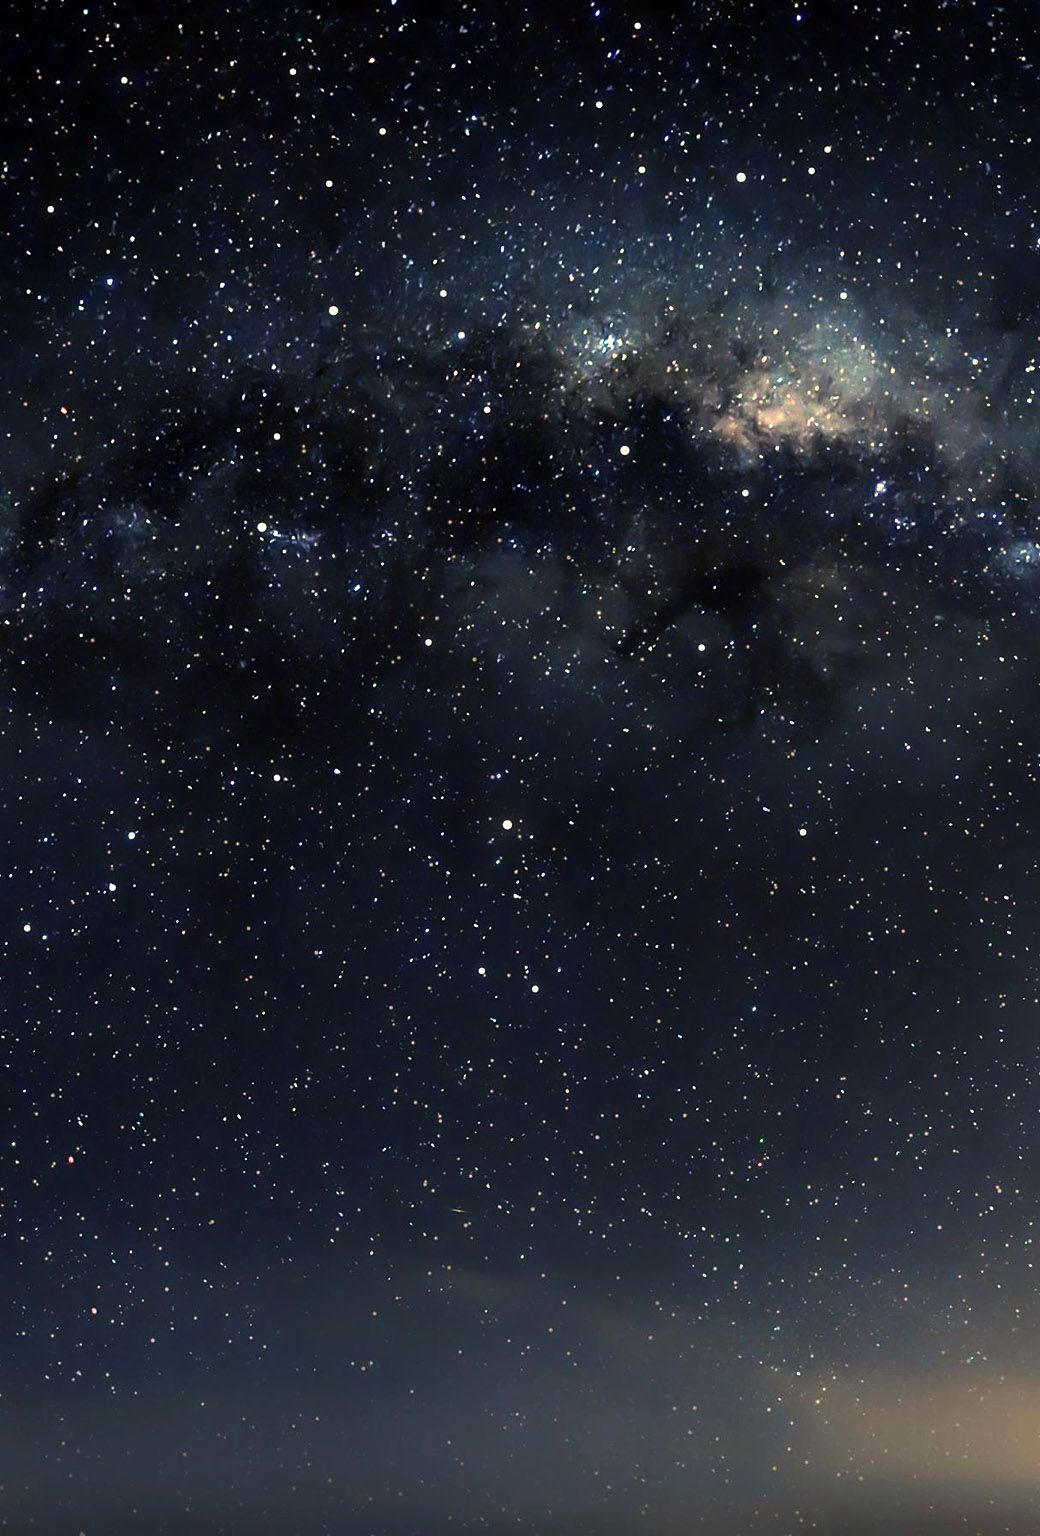 Starry sky Iphone wallpaper texture, Iphone wallpaper